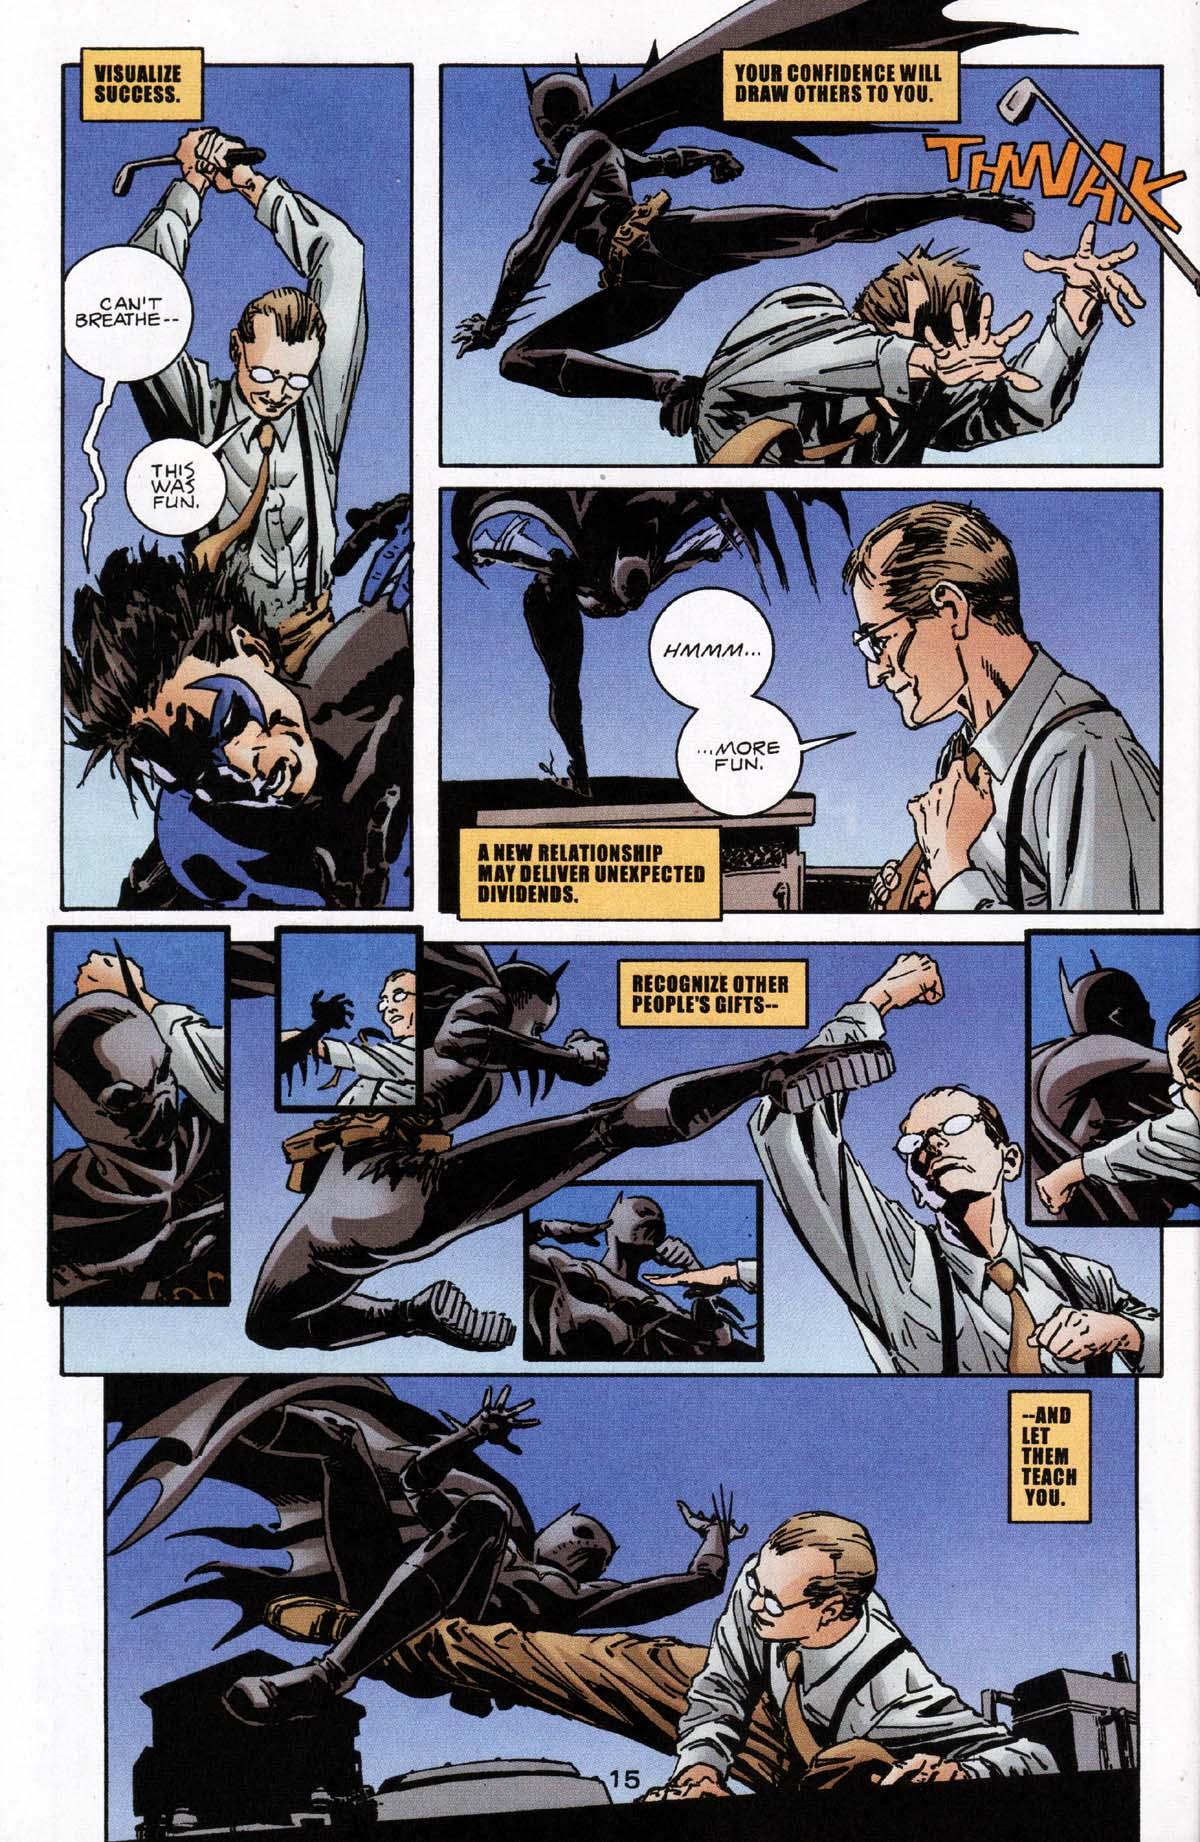 batman family 7 of 8-15 Nightwing Batgirl Mr Fun.jpg